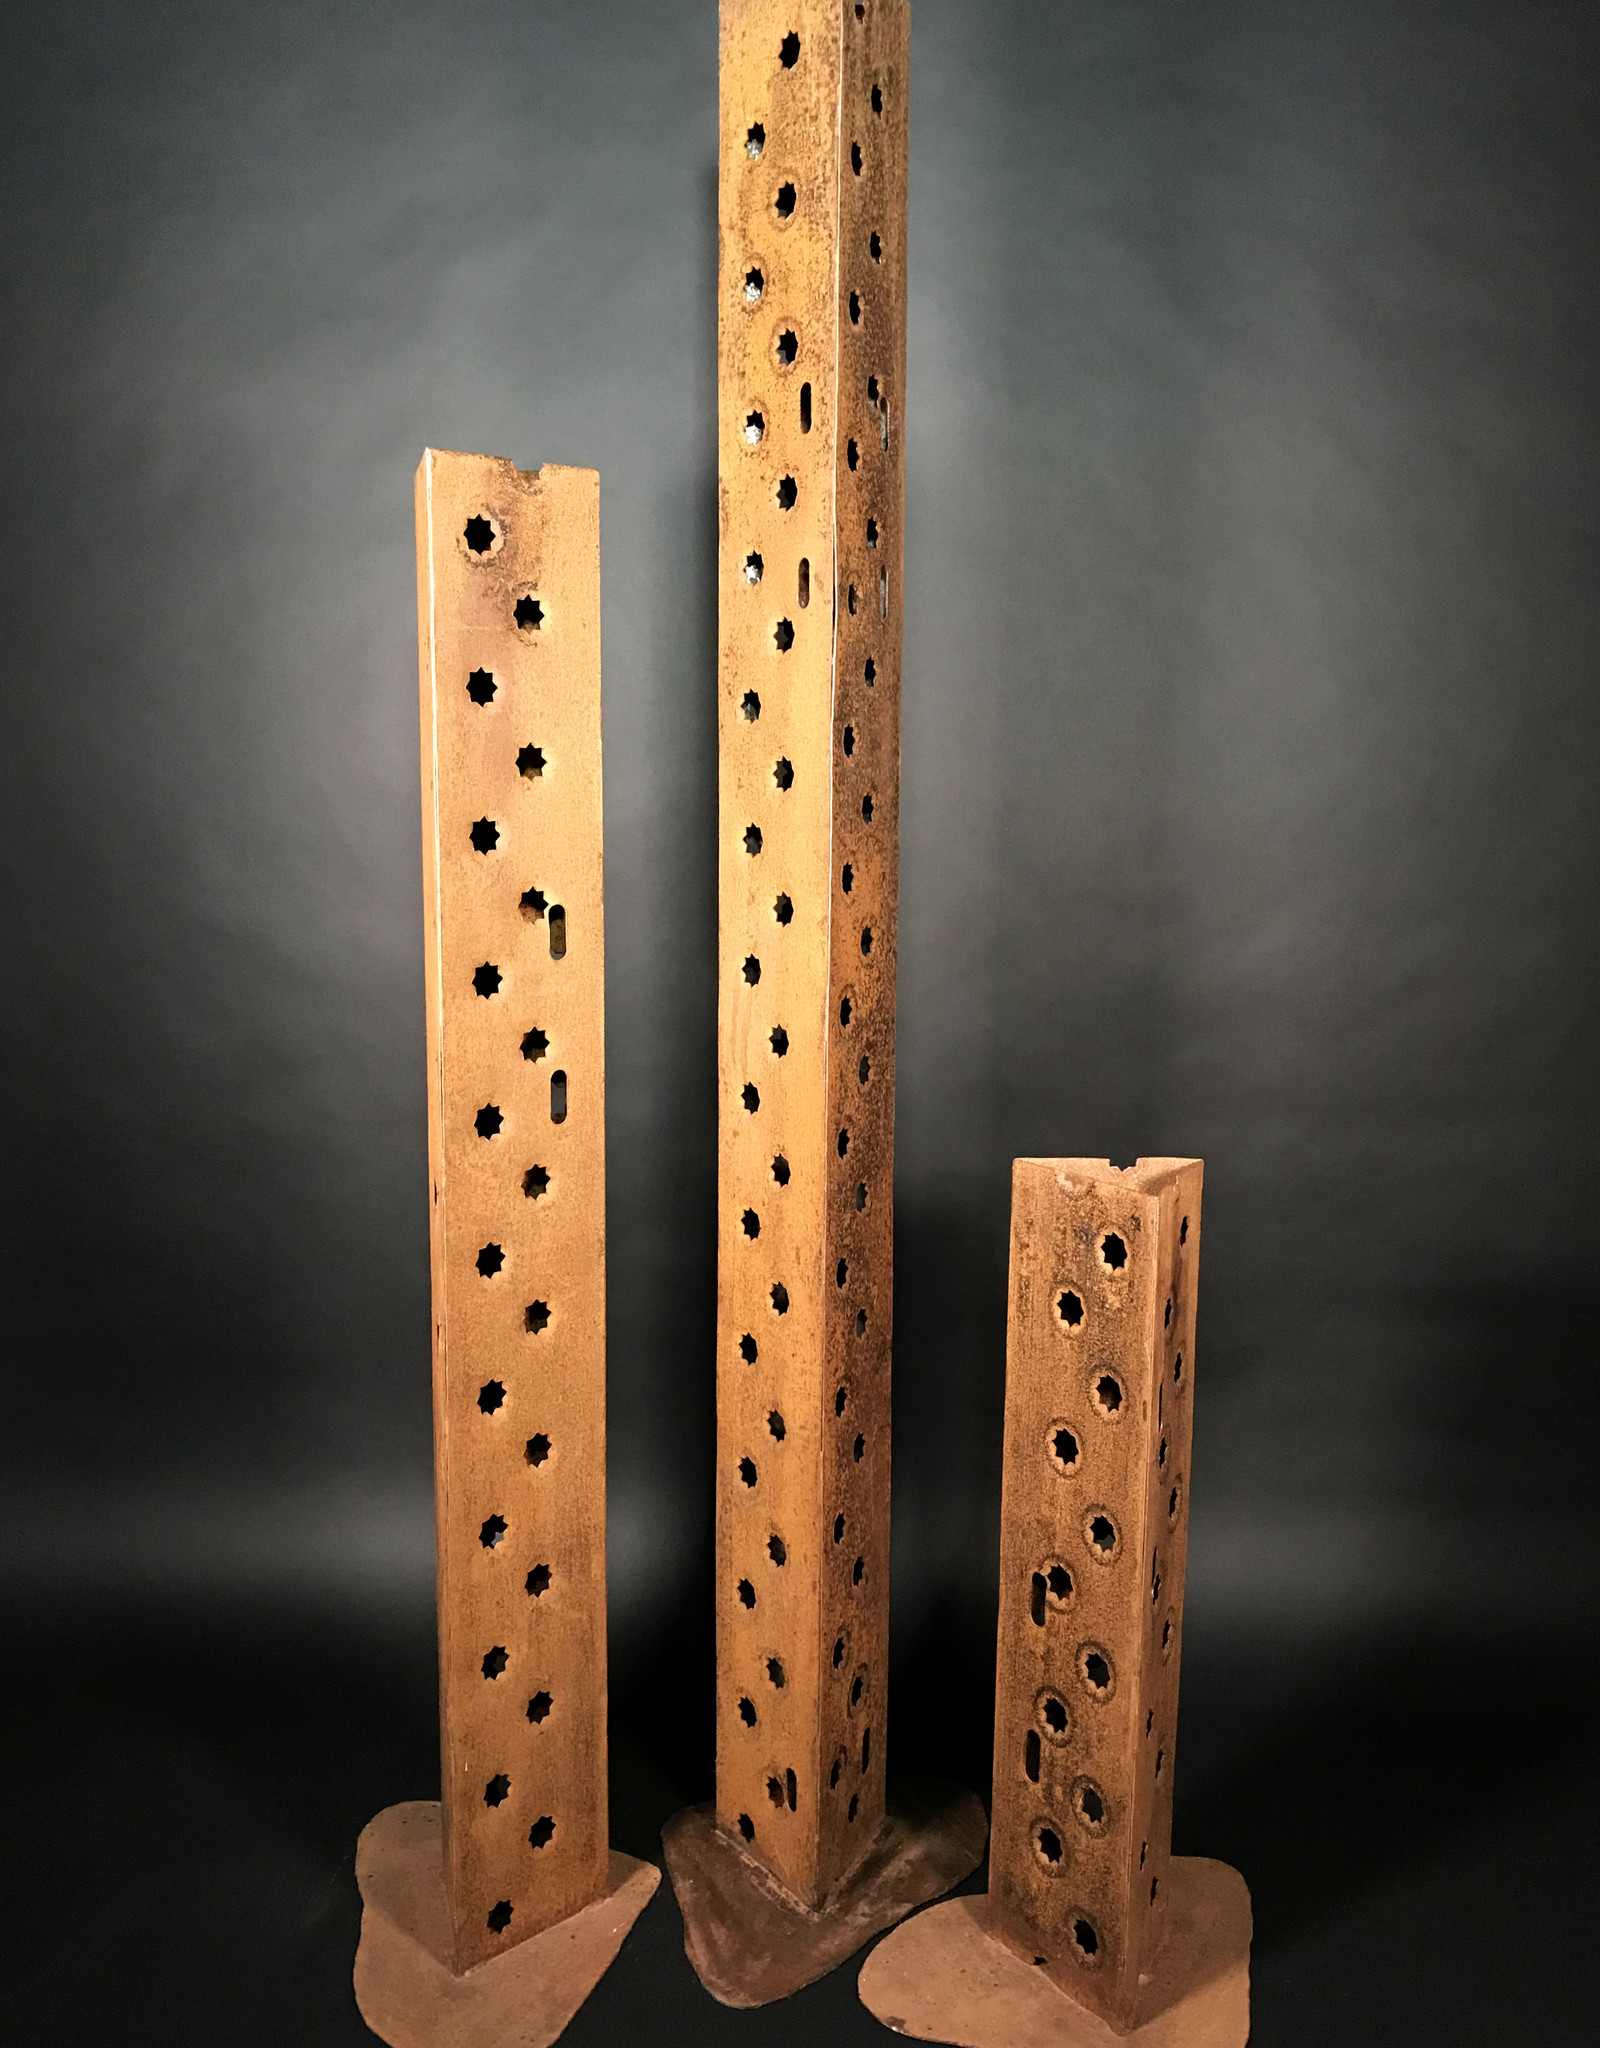 Shelly Durica-Laiche Trio of Columns